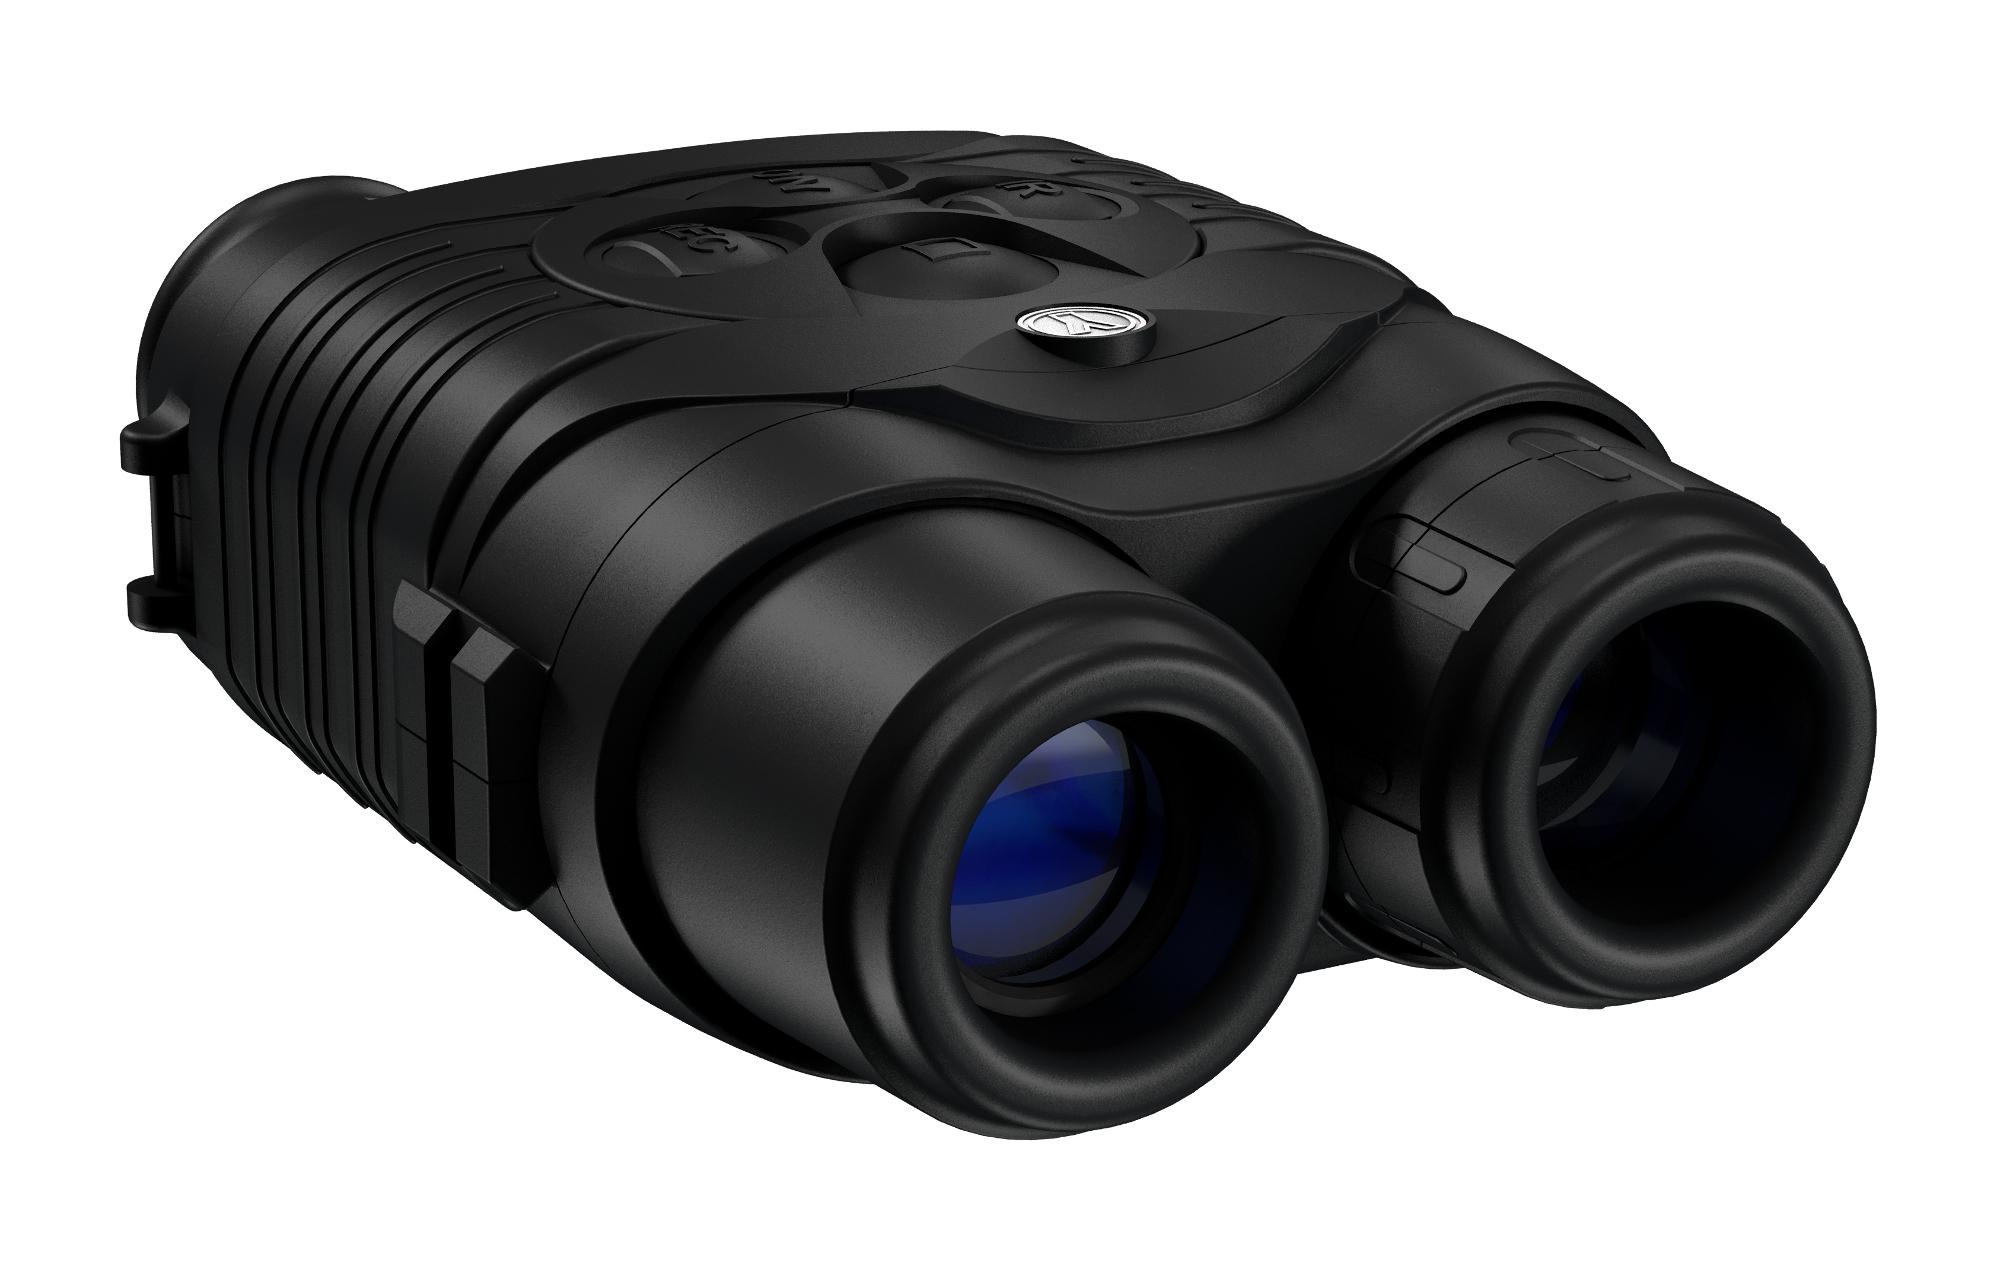 Yukon signal n320 rt 4.5x28 digitales nachtsichtgerät mono bresser